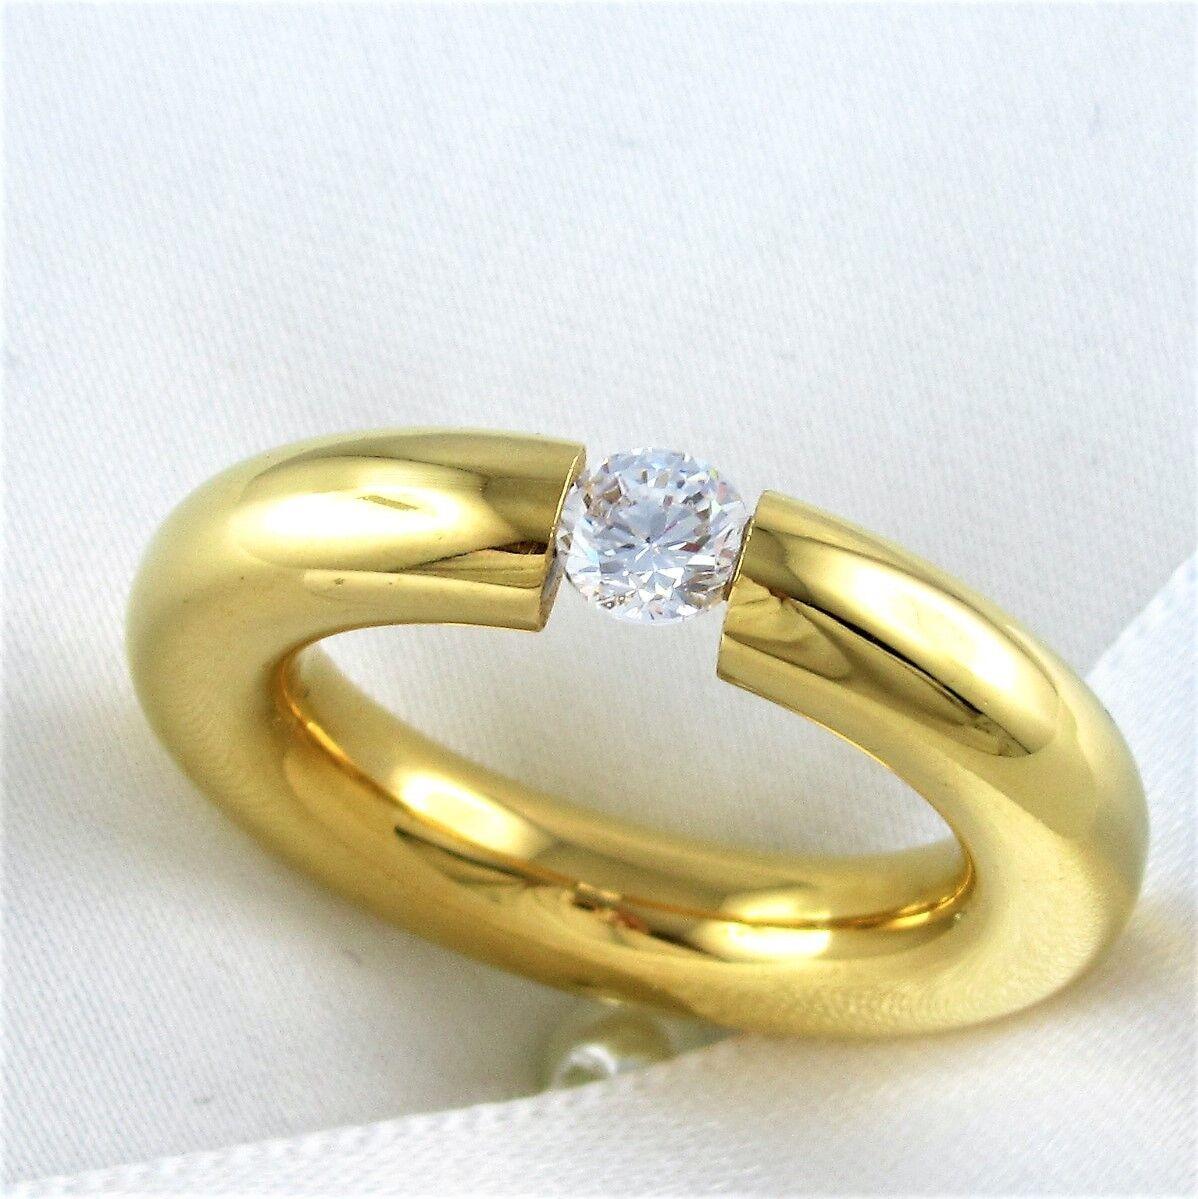 Edel Solitär Ring Weißgold vergoldet Liebe Zirkonia Verlobung Damen Geschenk